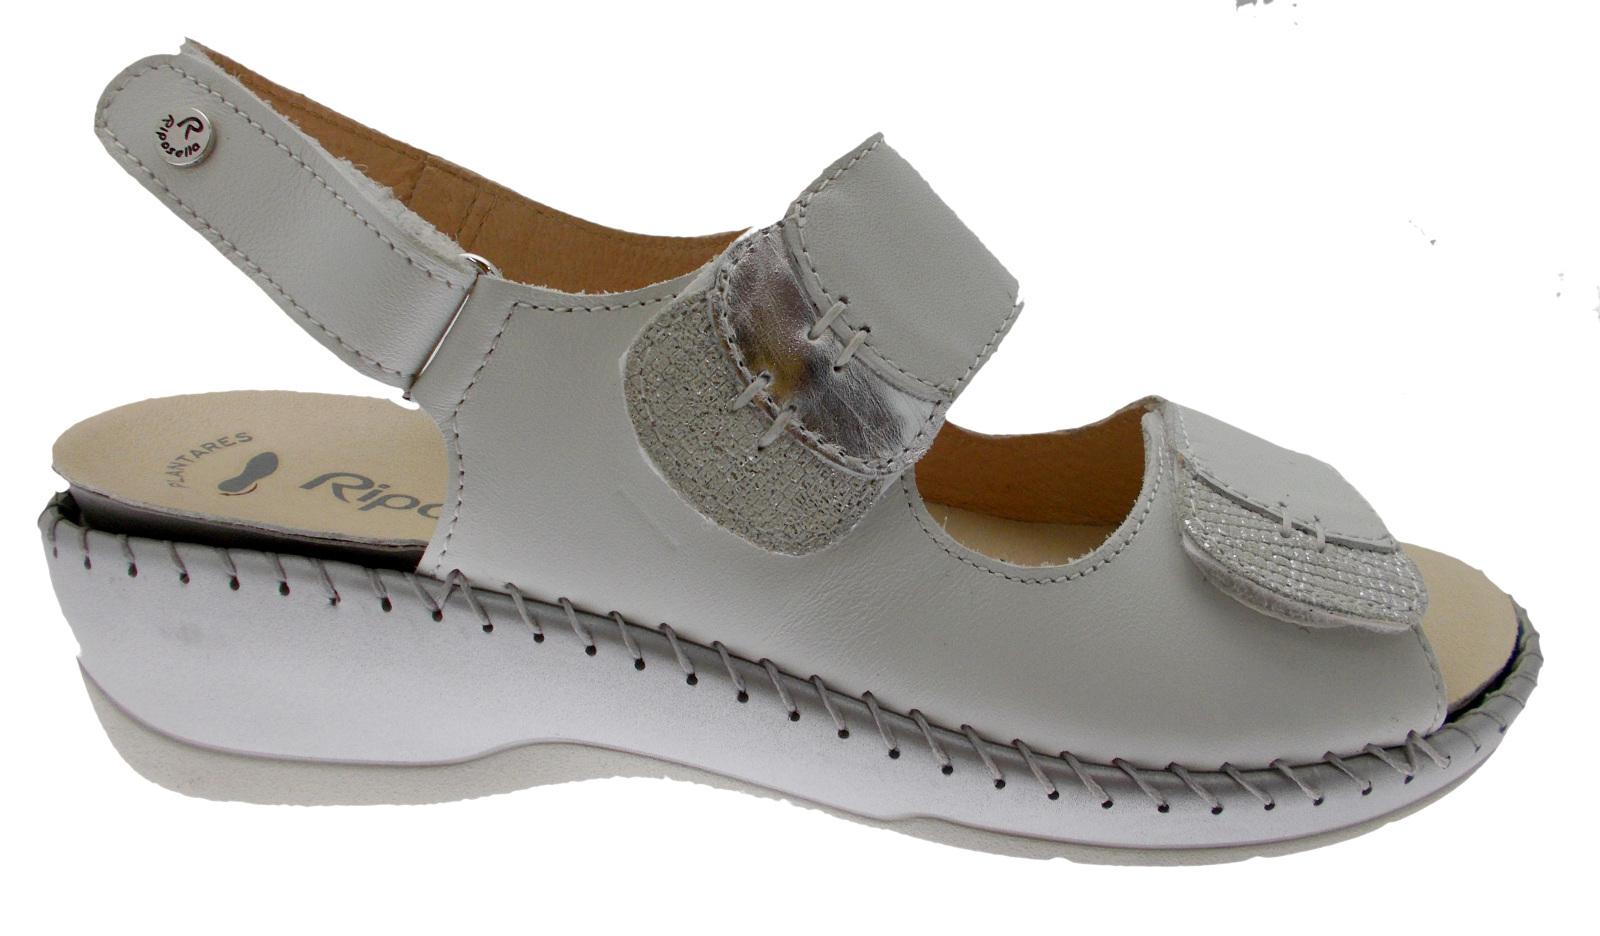 6436  sandalo bianco regolabile sottopiede estraibile ortopedico Riposella Riposella Riposella 43fa3f